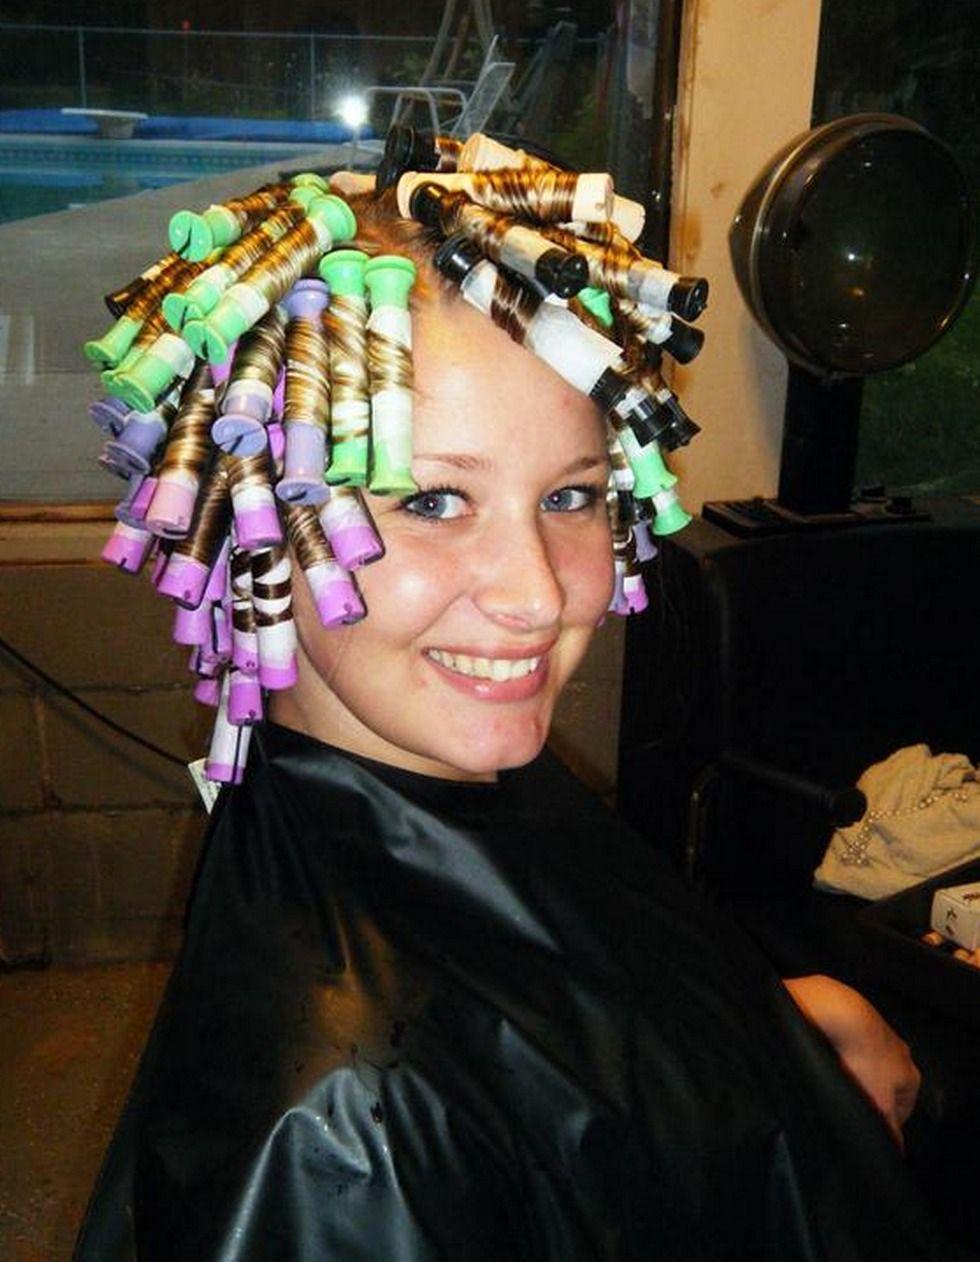 Extreme hair perm newhairstylesformen2014 com